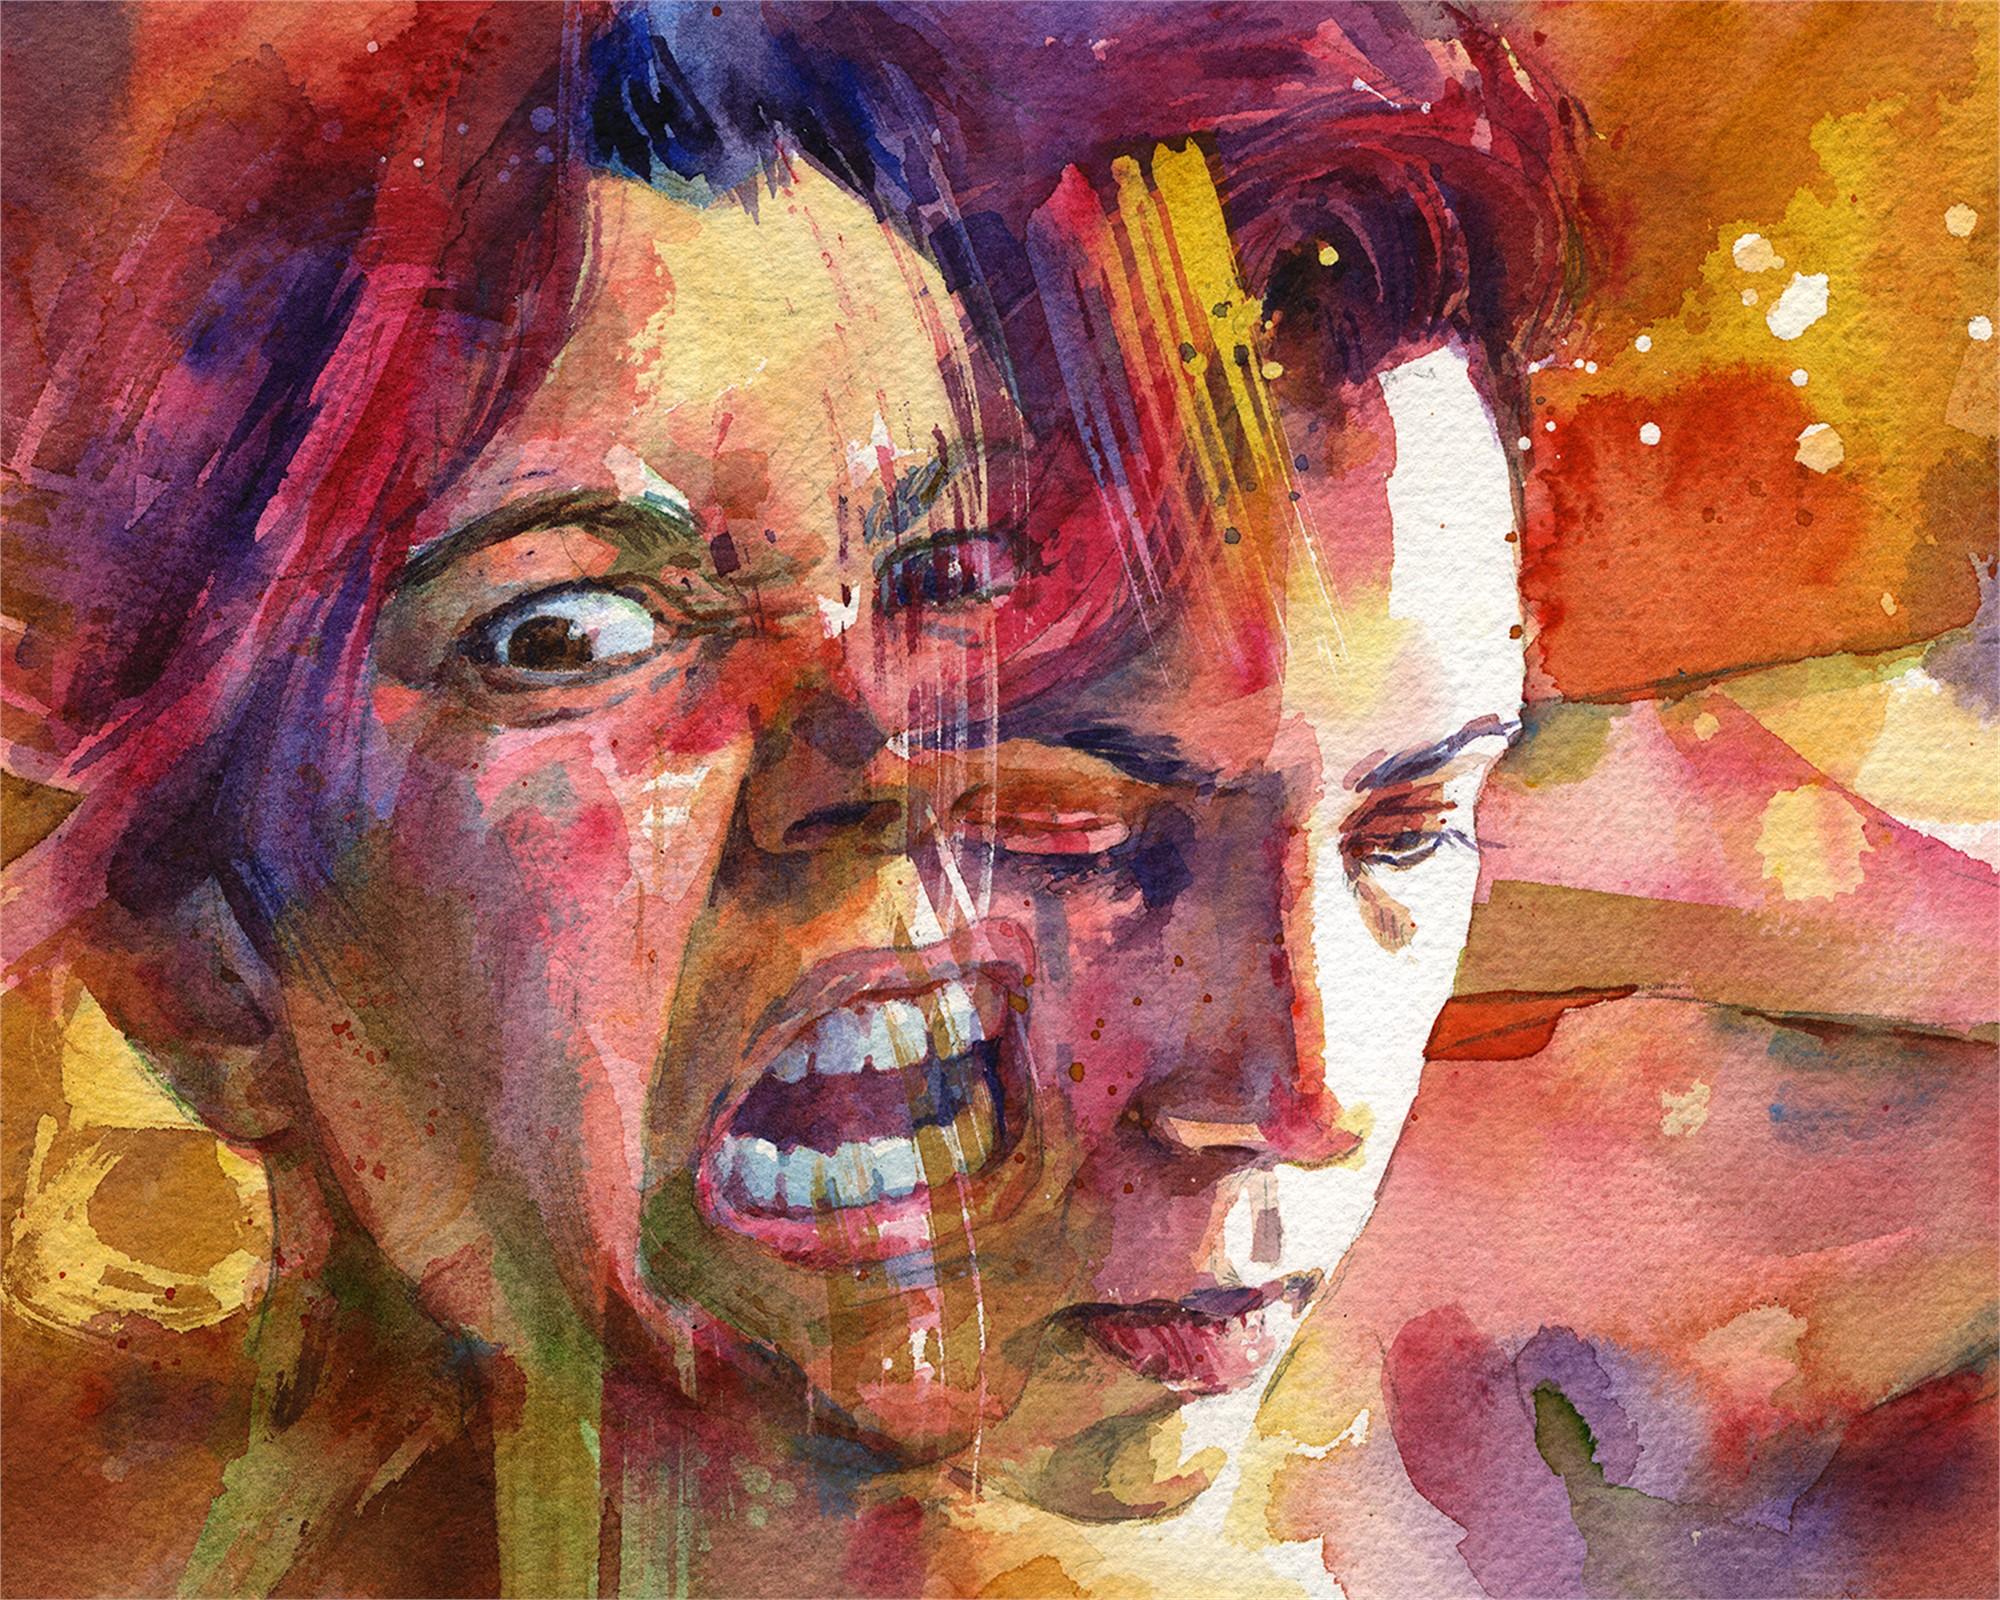 Snarl by Joanna Barnum